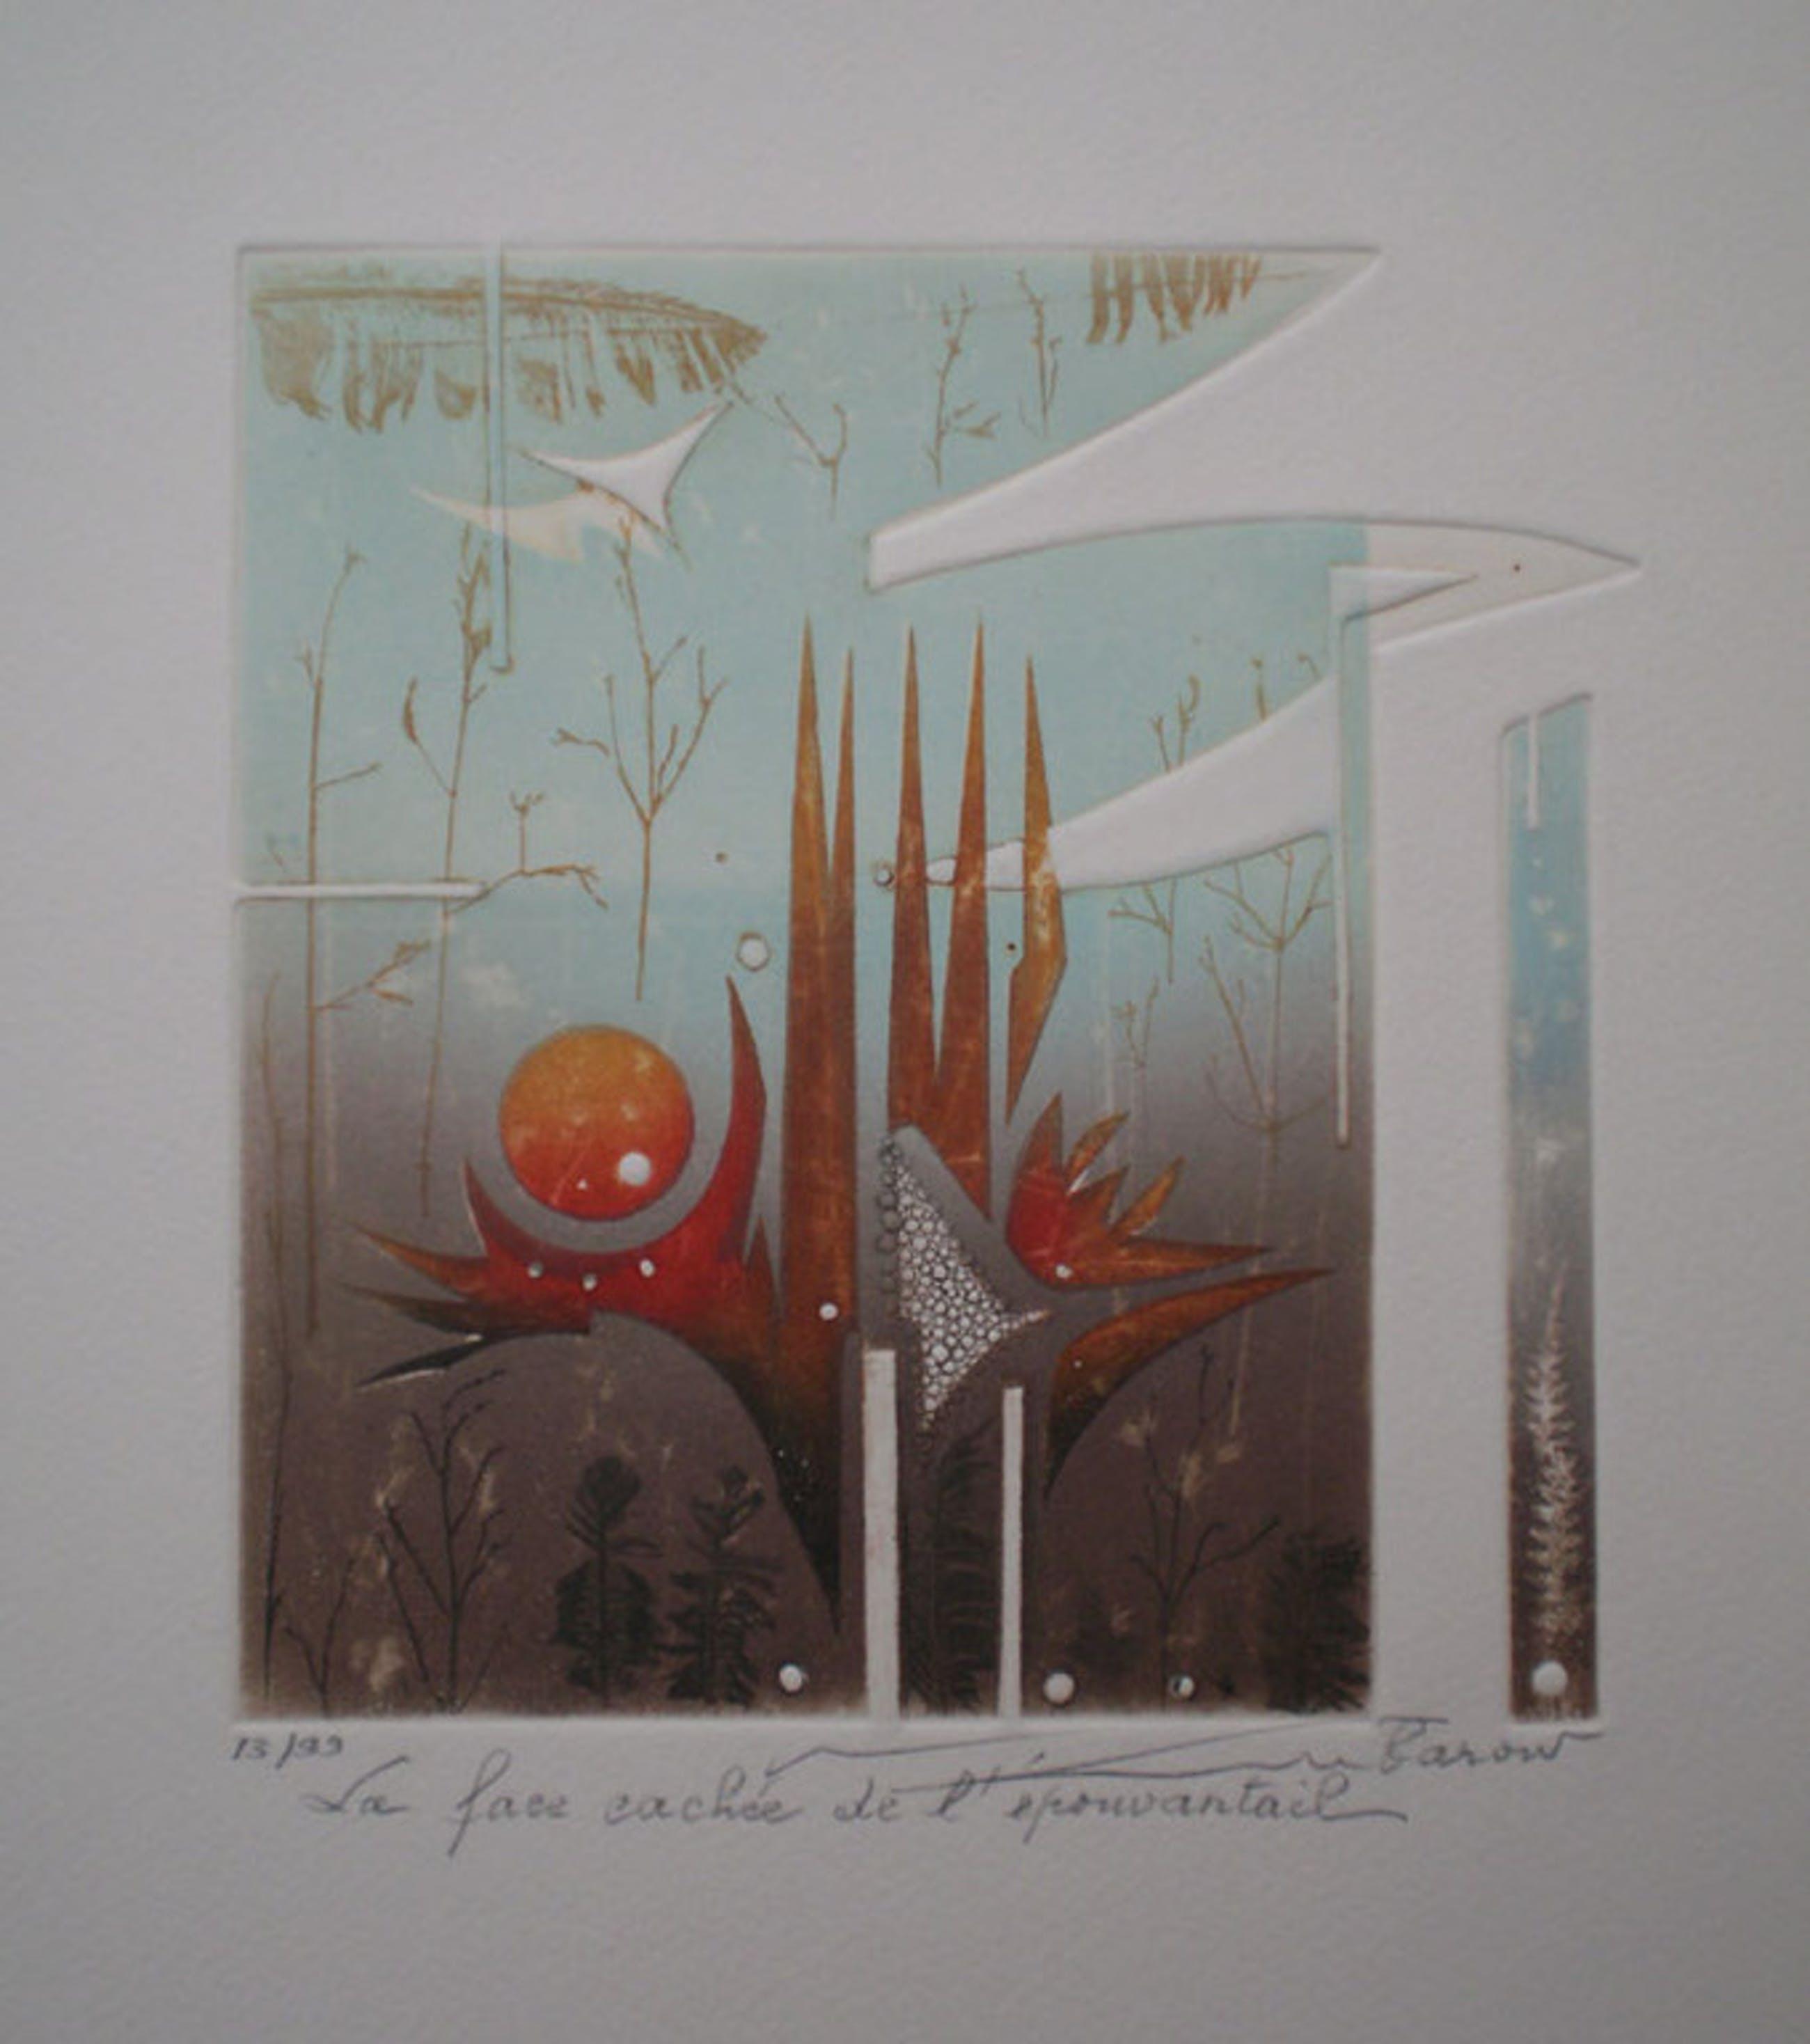 RENEÉ LUBAROW (* 1923 Seyssins/Grenoble) - bekannte franz. Malerin /  Grafikerin kopen? Bied vanaf 30!